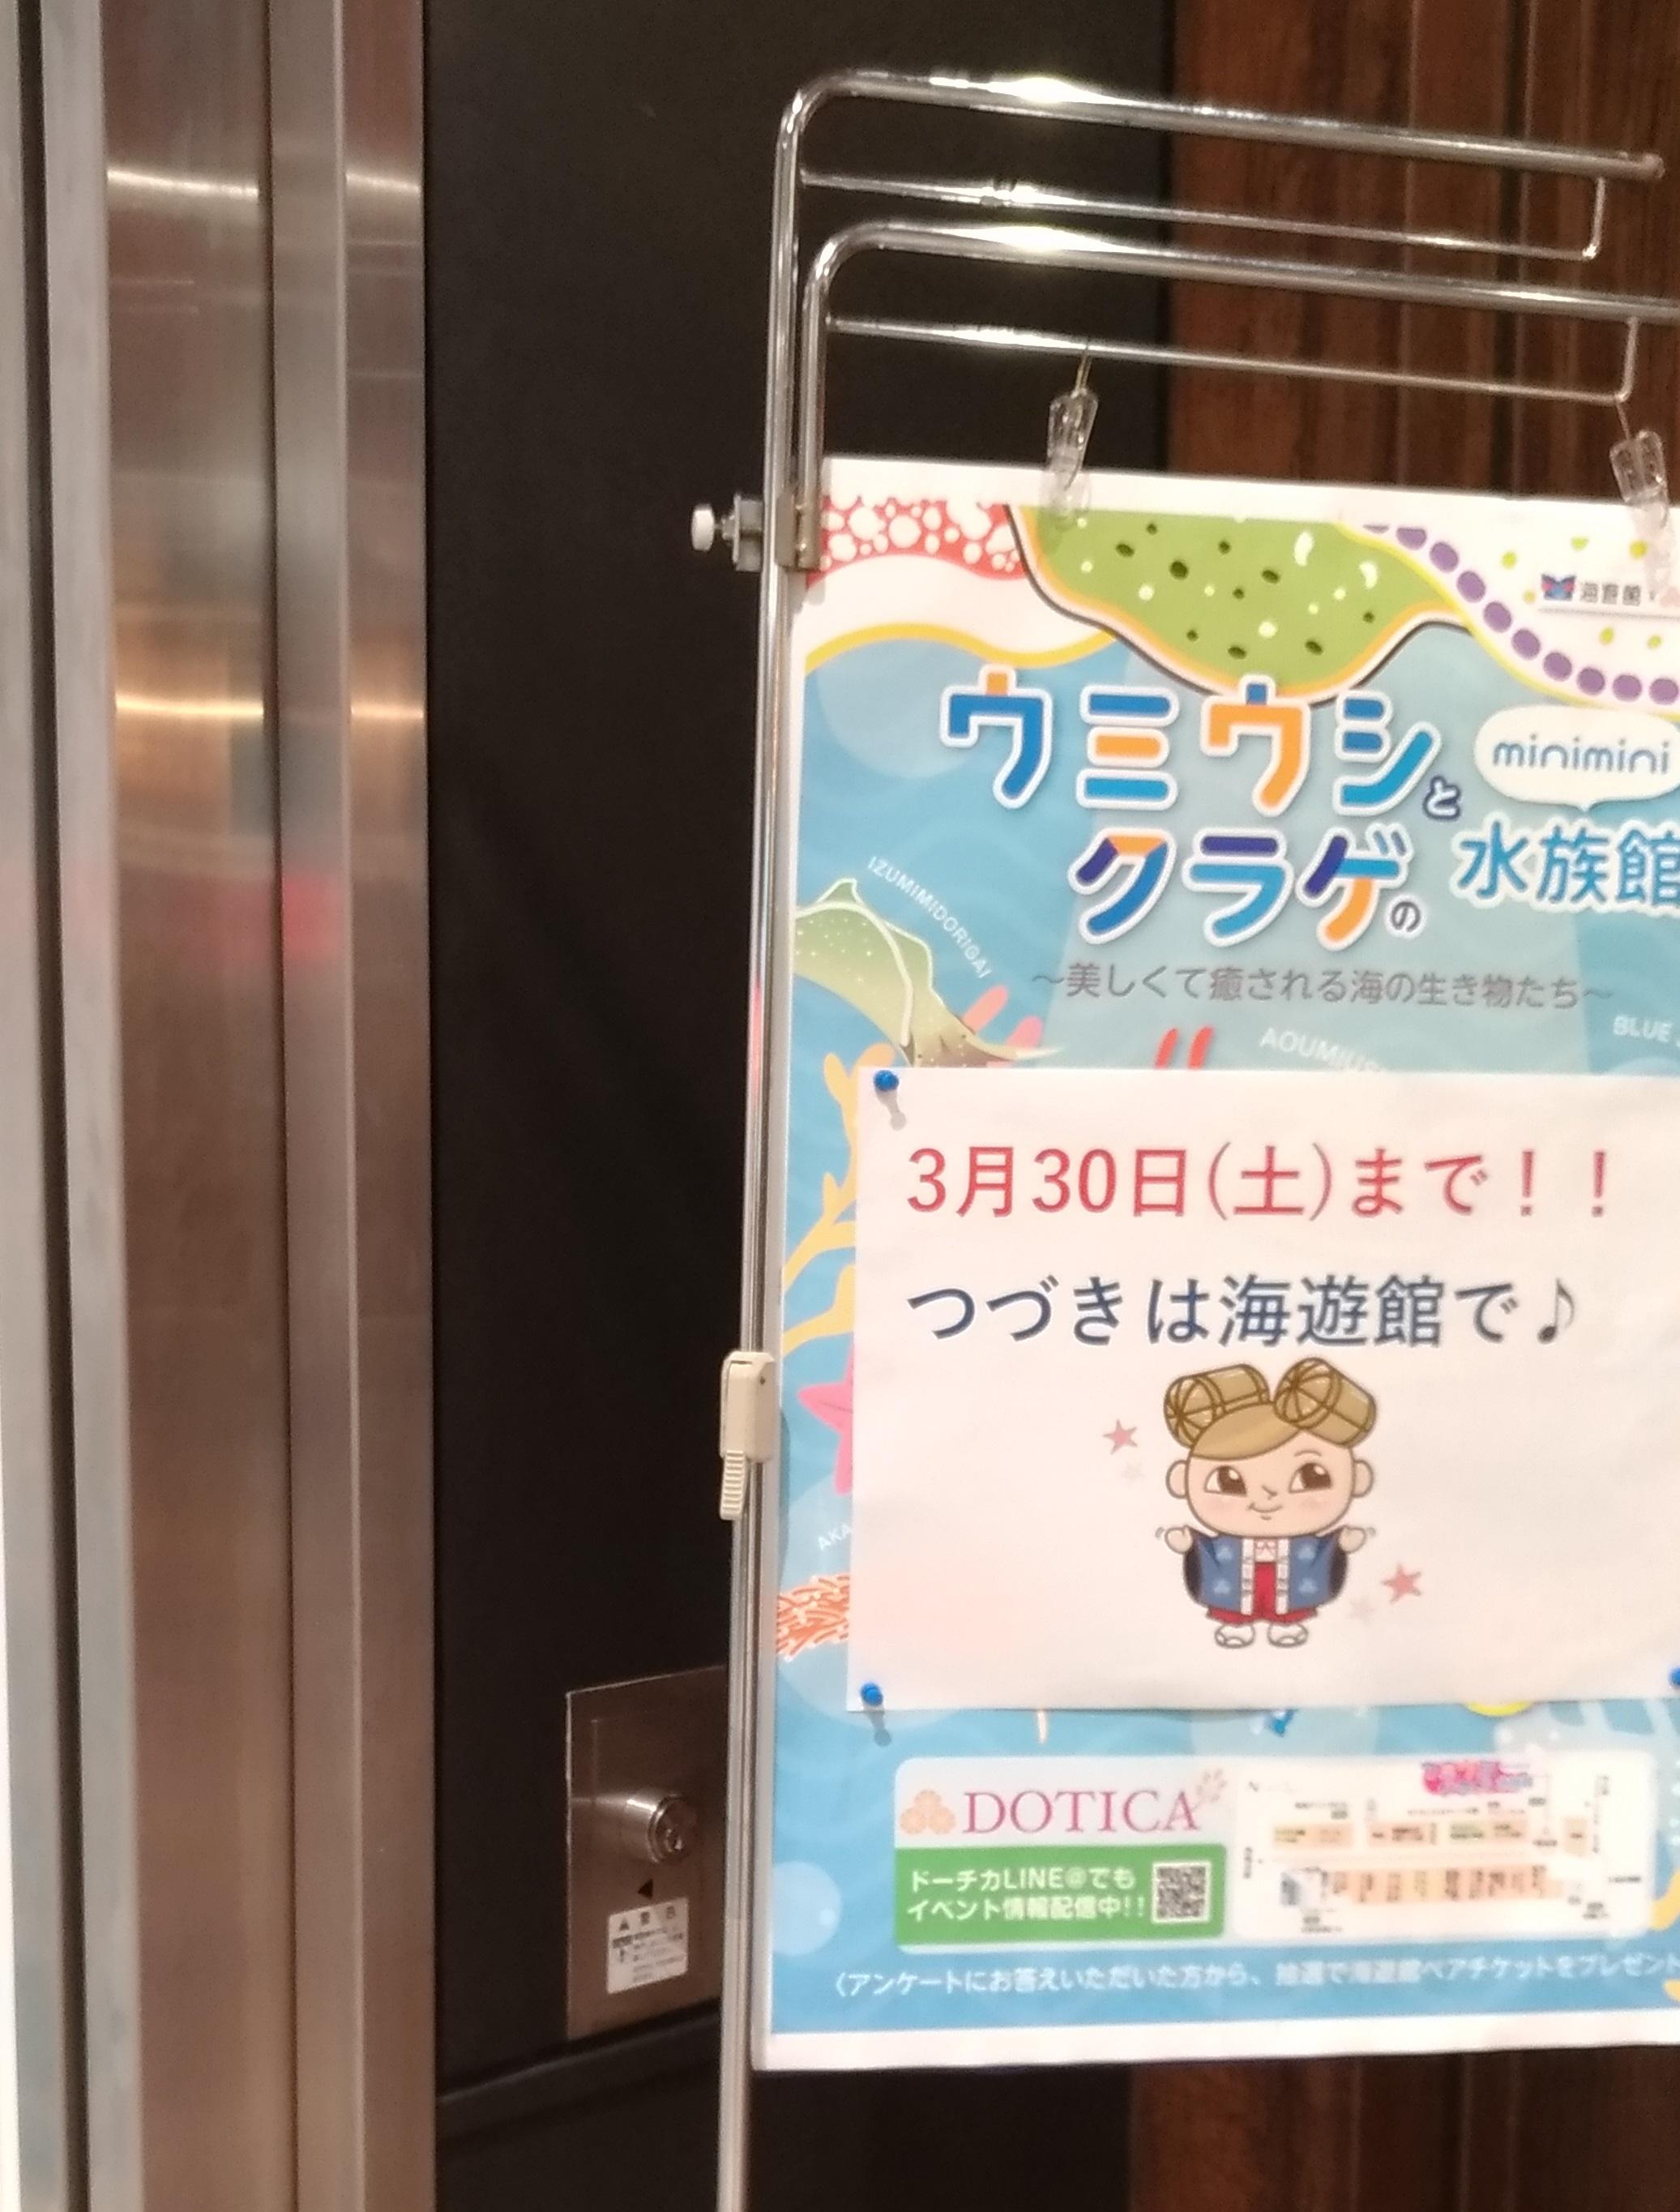 osaka_dotica_umeda_kaiyukan.jpg